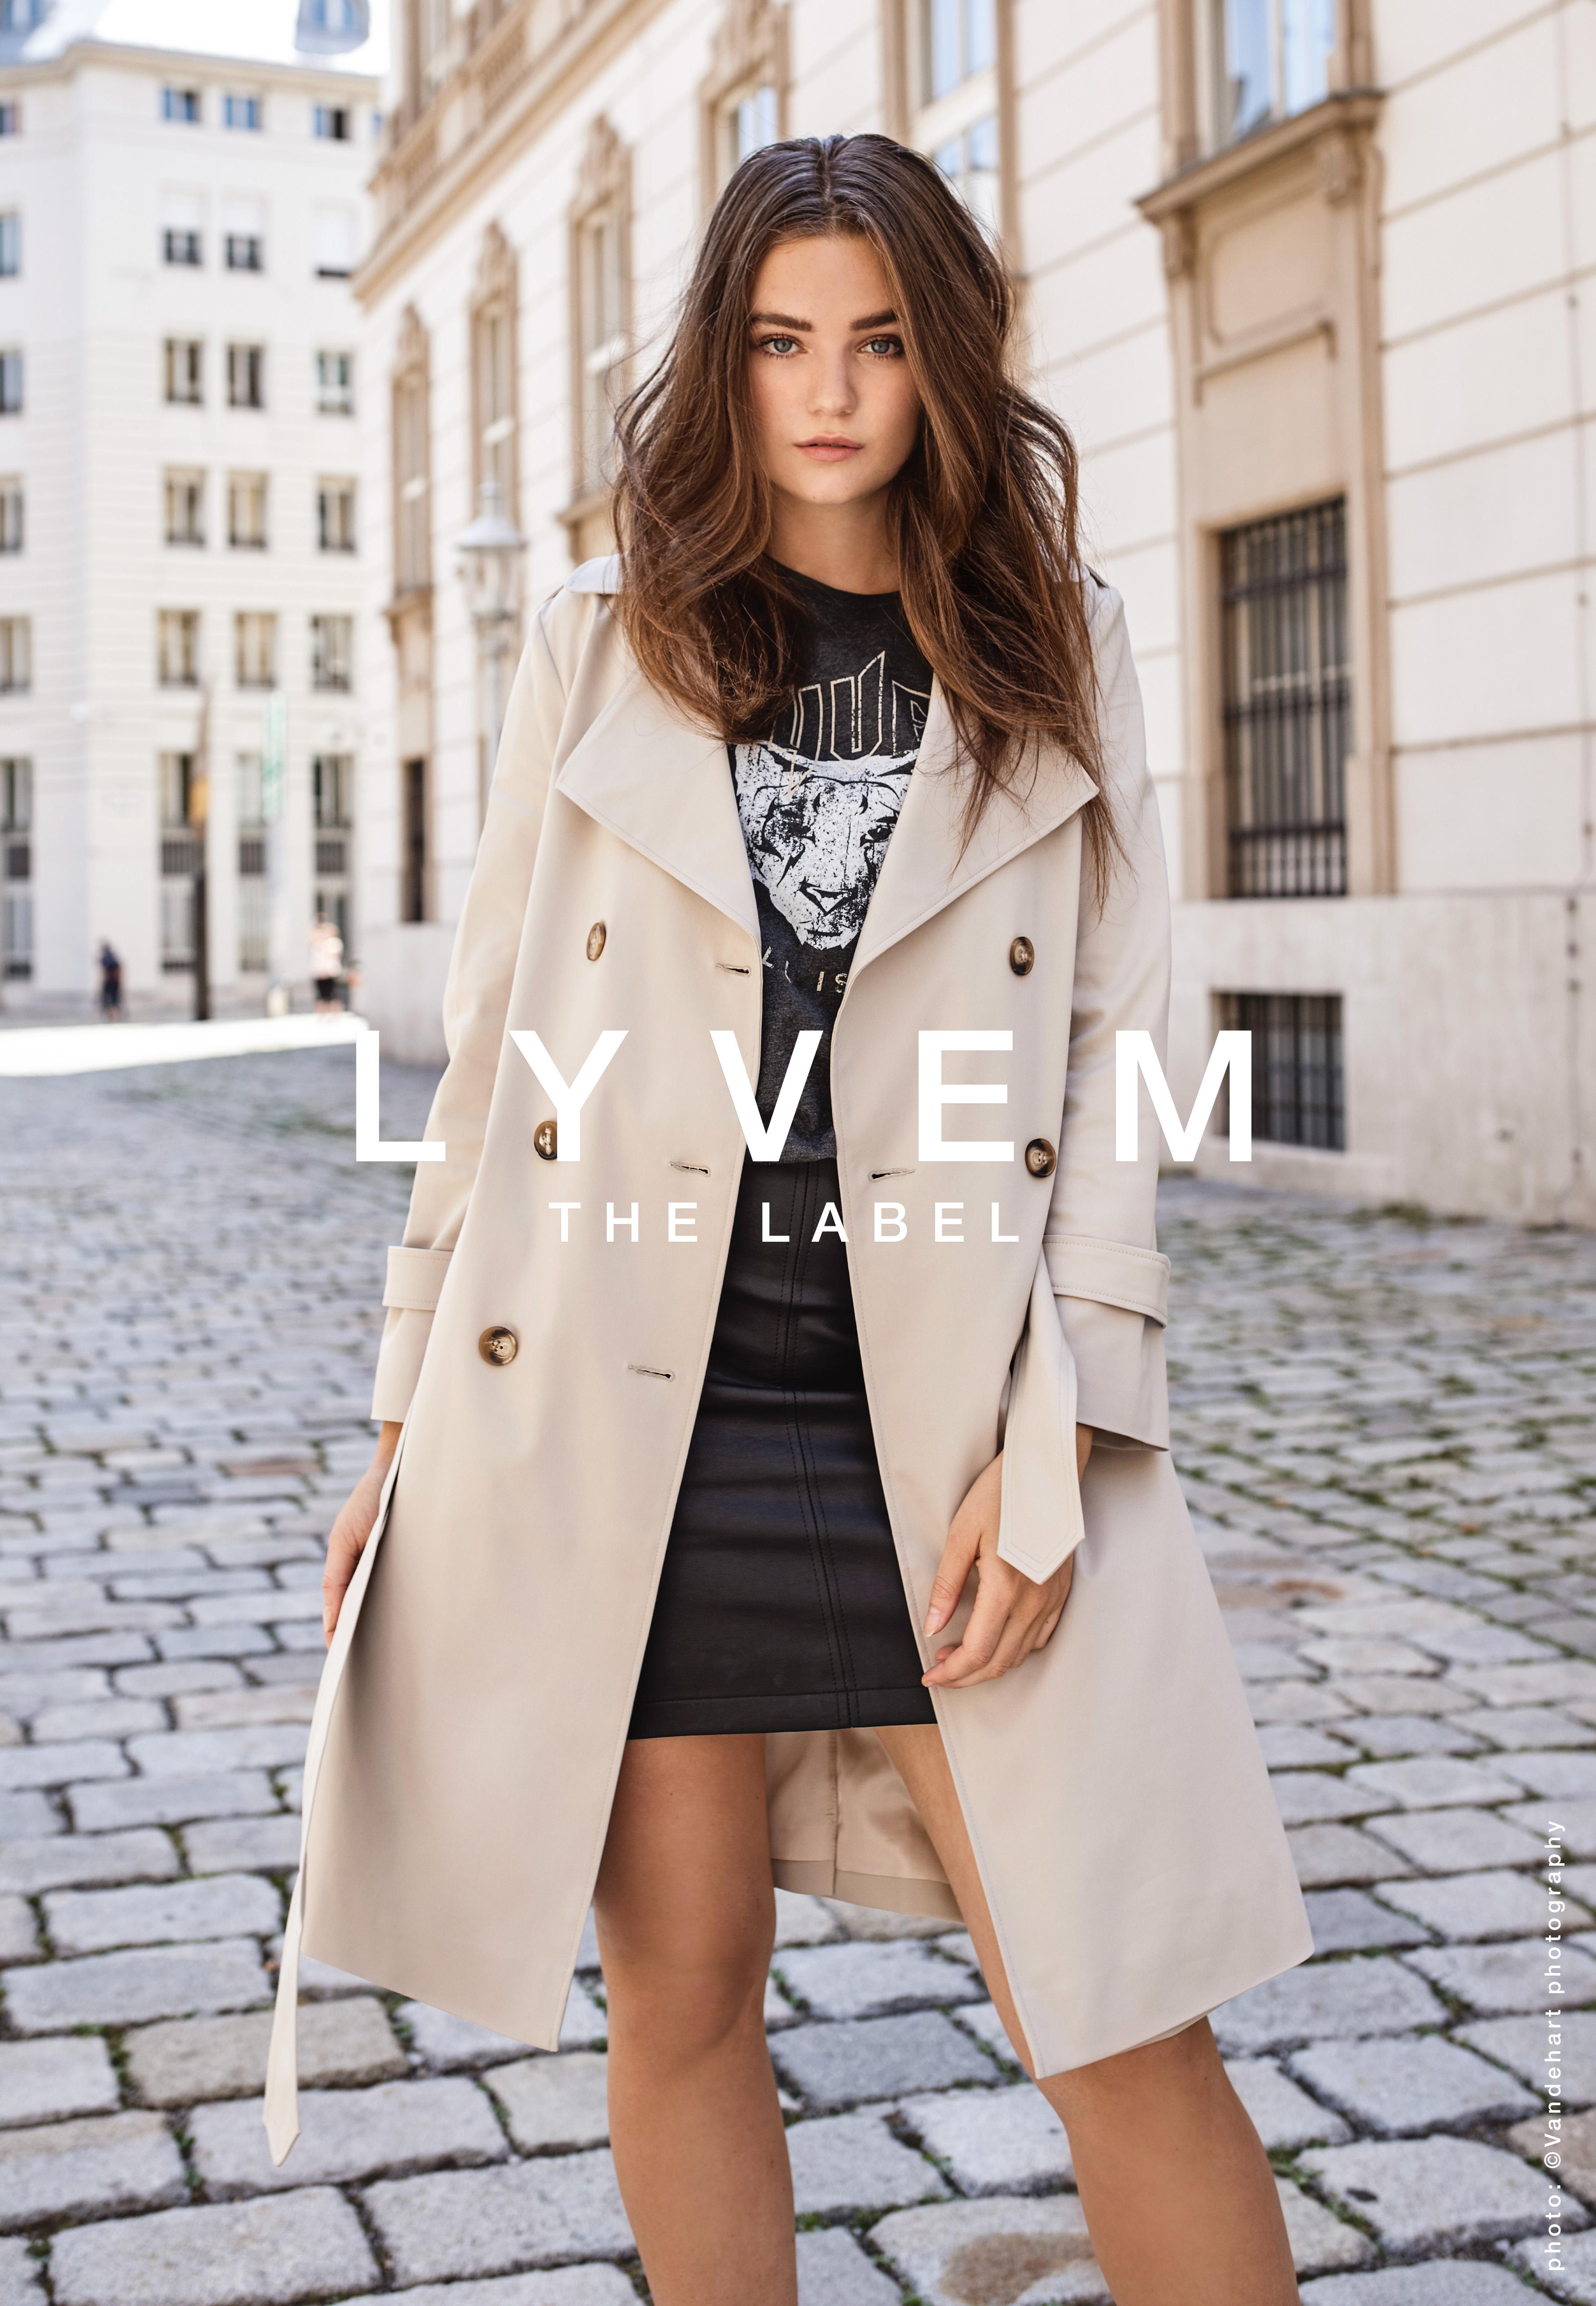 MQVFW.19 LYVEM The Label © Vandehart Photography